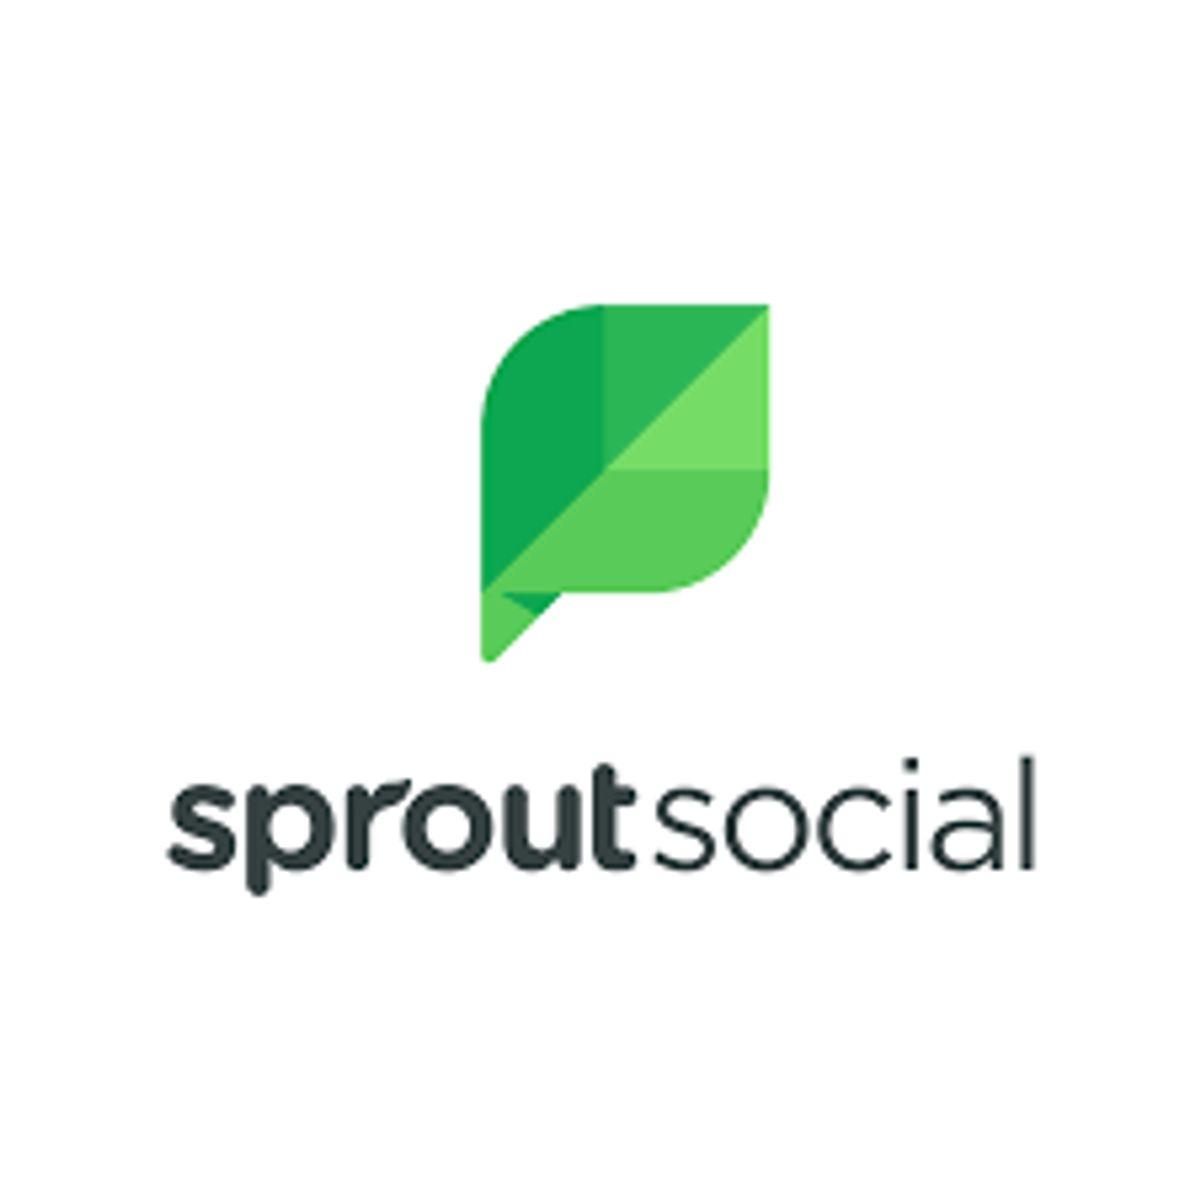 Sprout Social Reviews